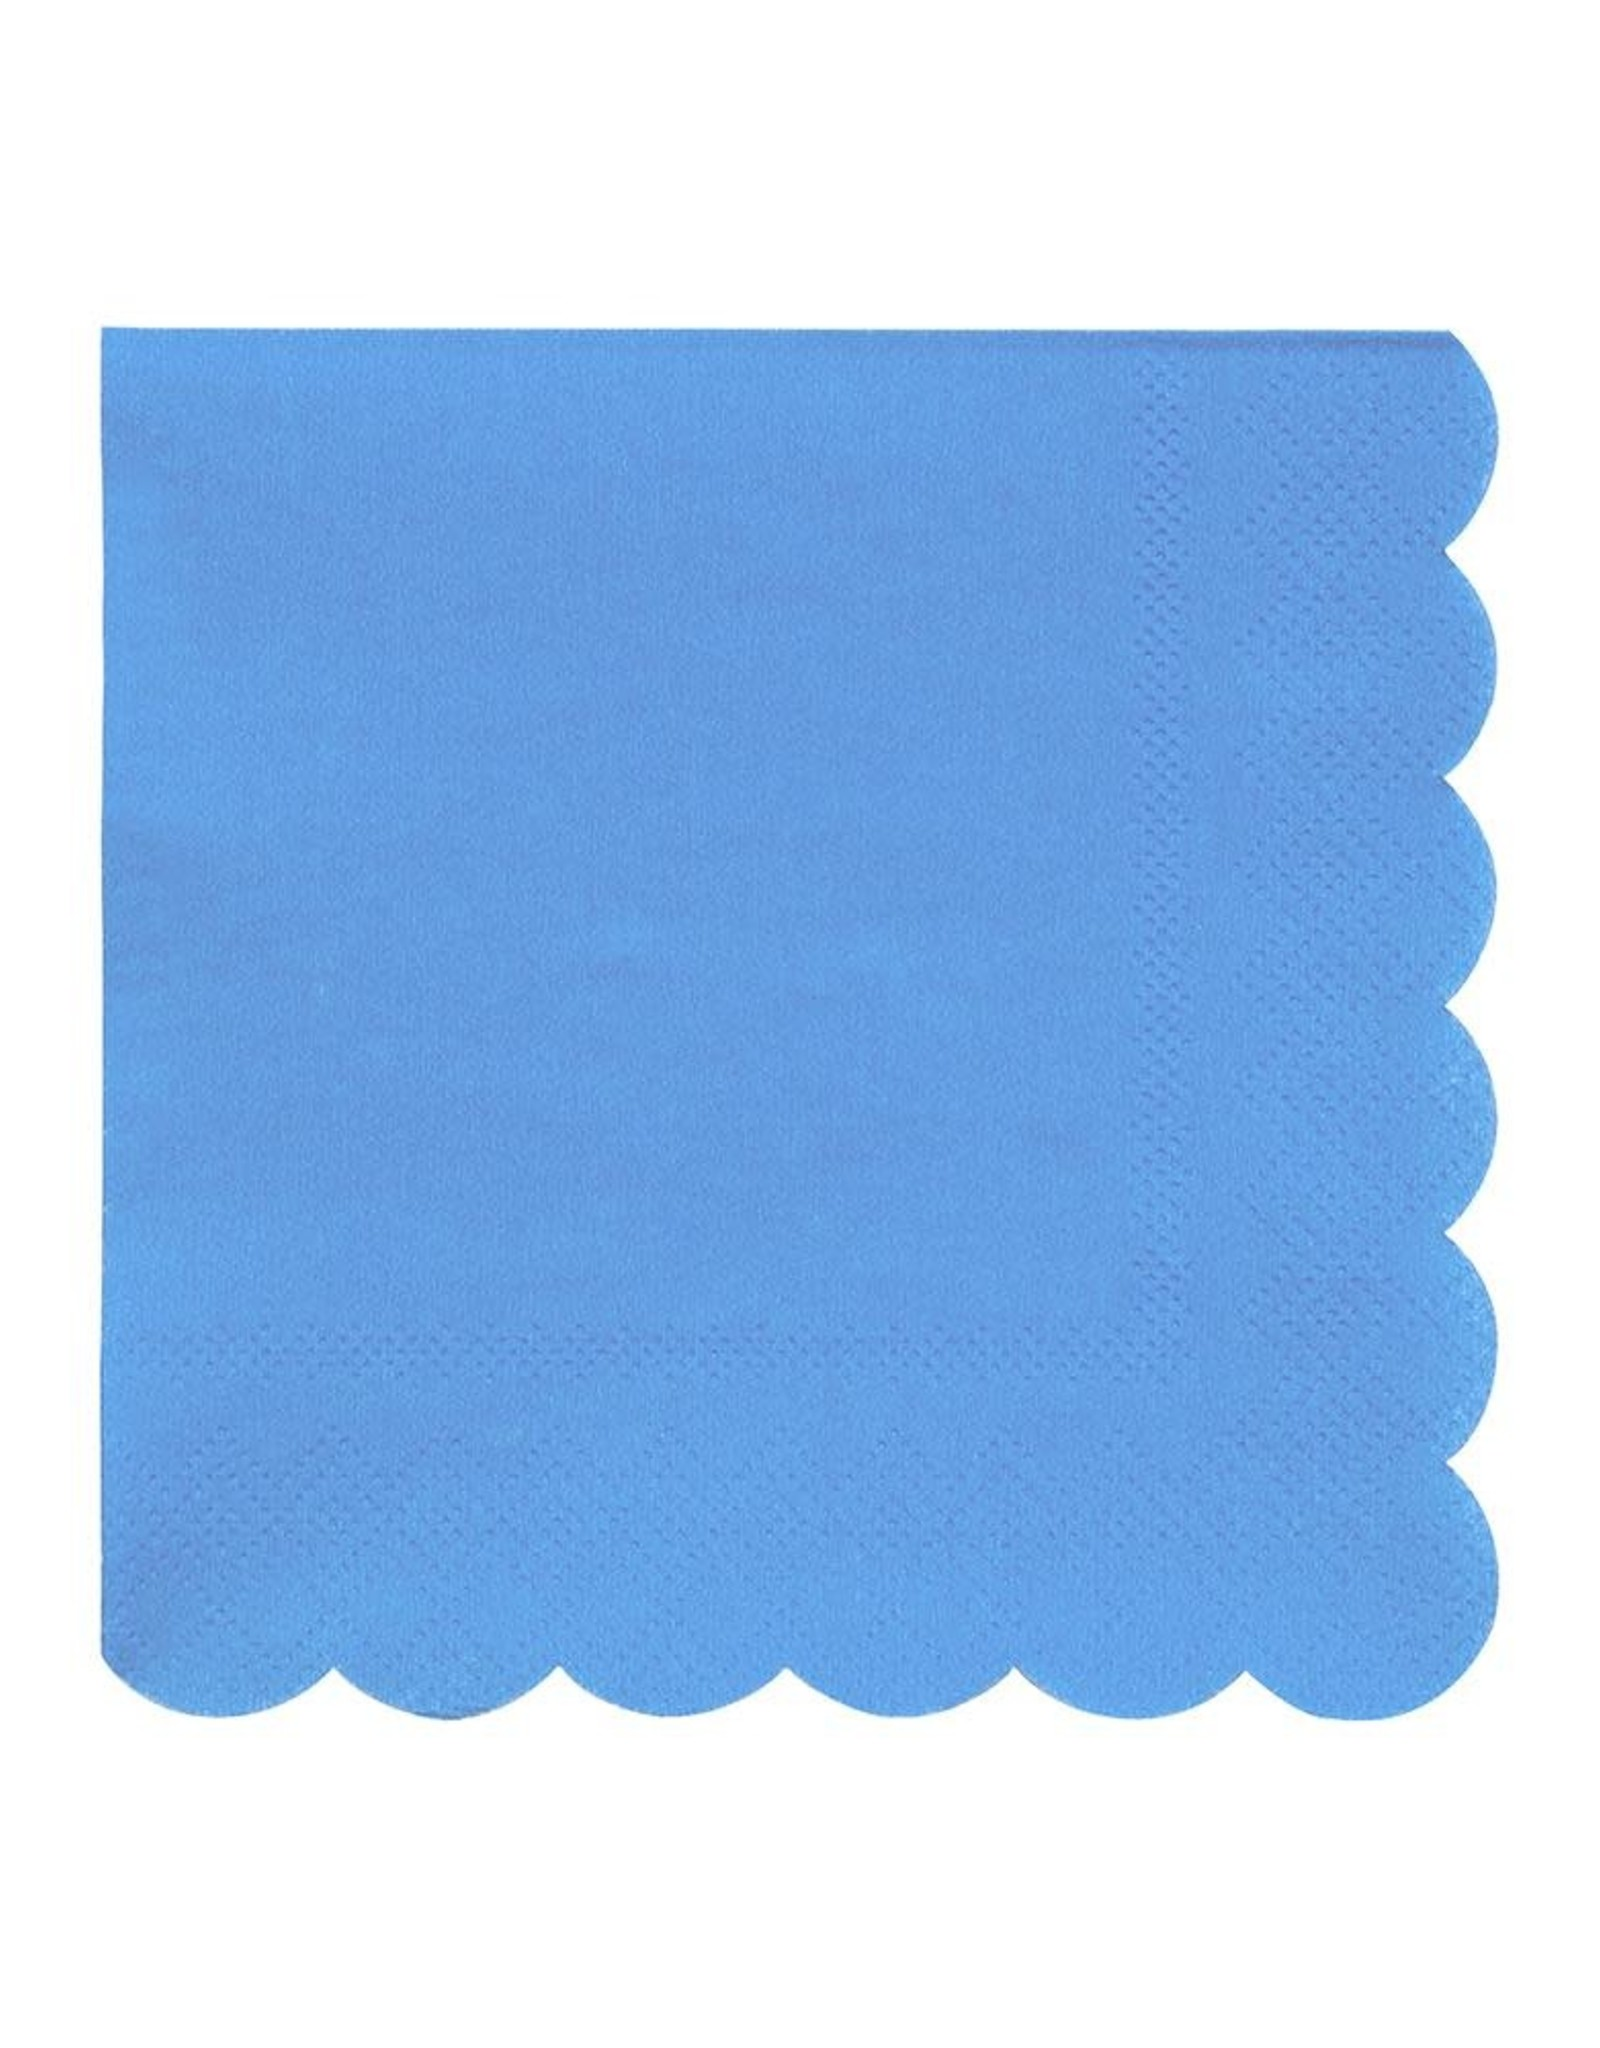 Meri Meri bright blue napkins- small